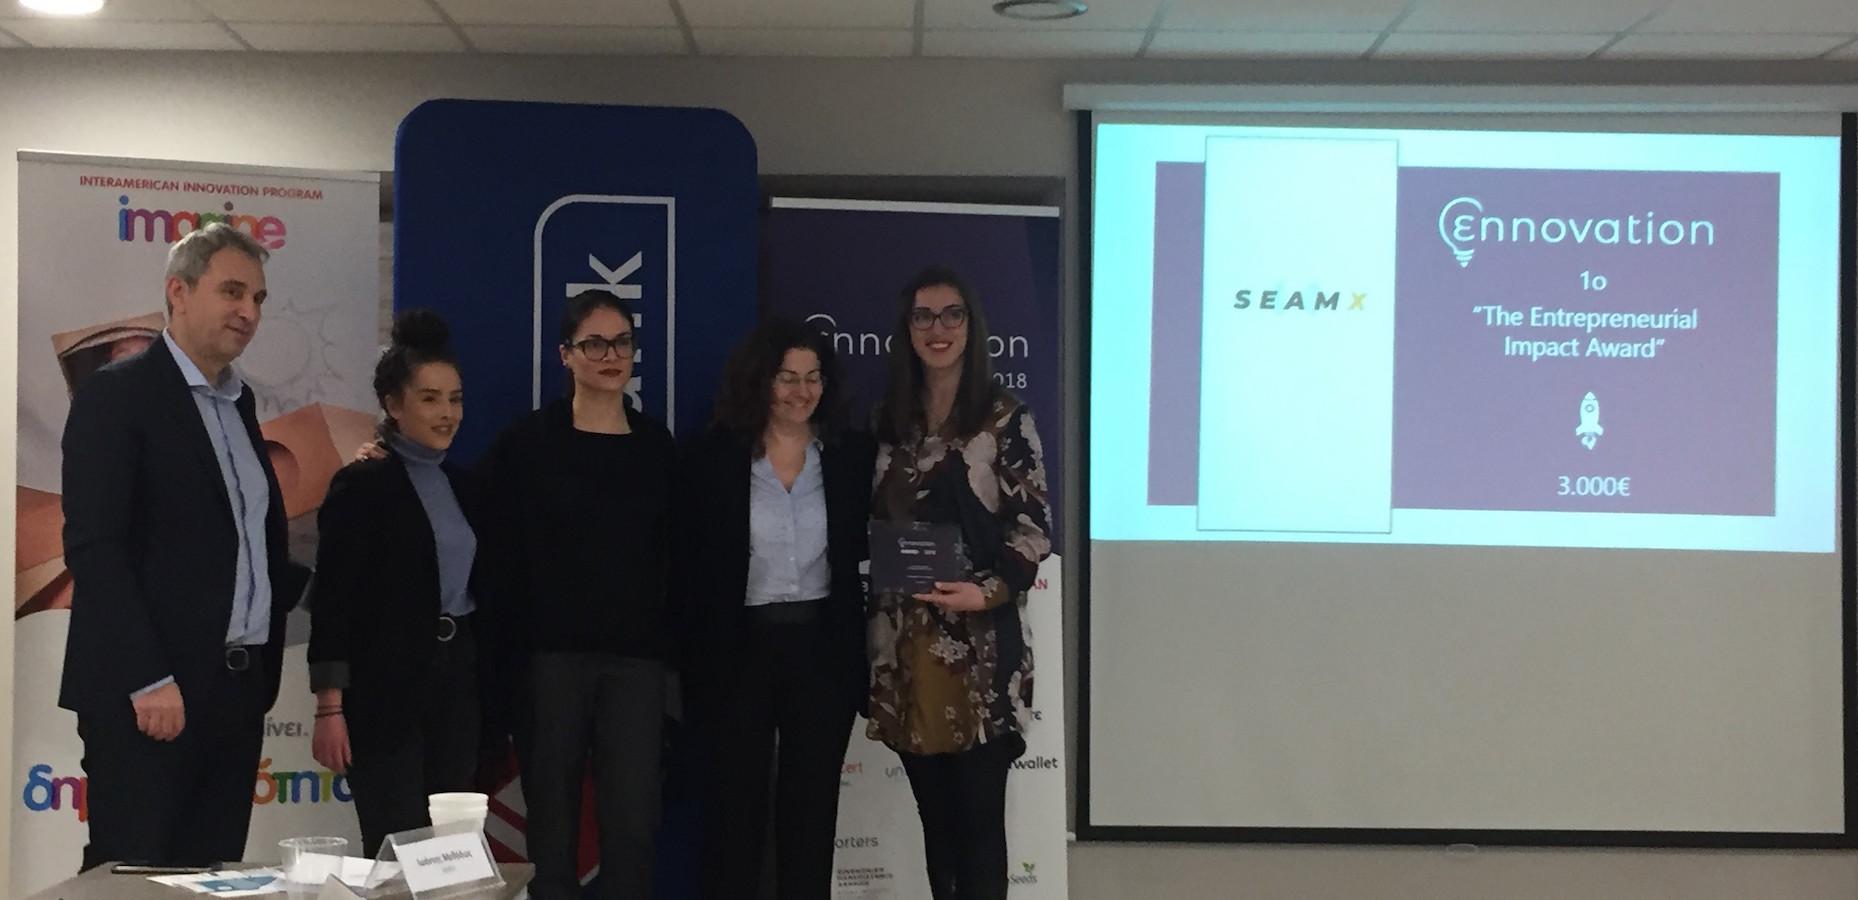 O Αναπληρωτής Καθηγητής του Τμήματος Επιστήμης Φυσικής Αγωγής και Αθλητισμού του ΑΠΘ (Σέρρες),  Νικόλαος  Θεοδωράκης, και  μέλη της  ομάδας SEAMX Ennovation 2018